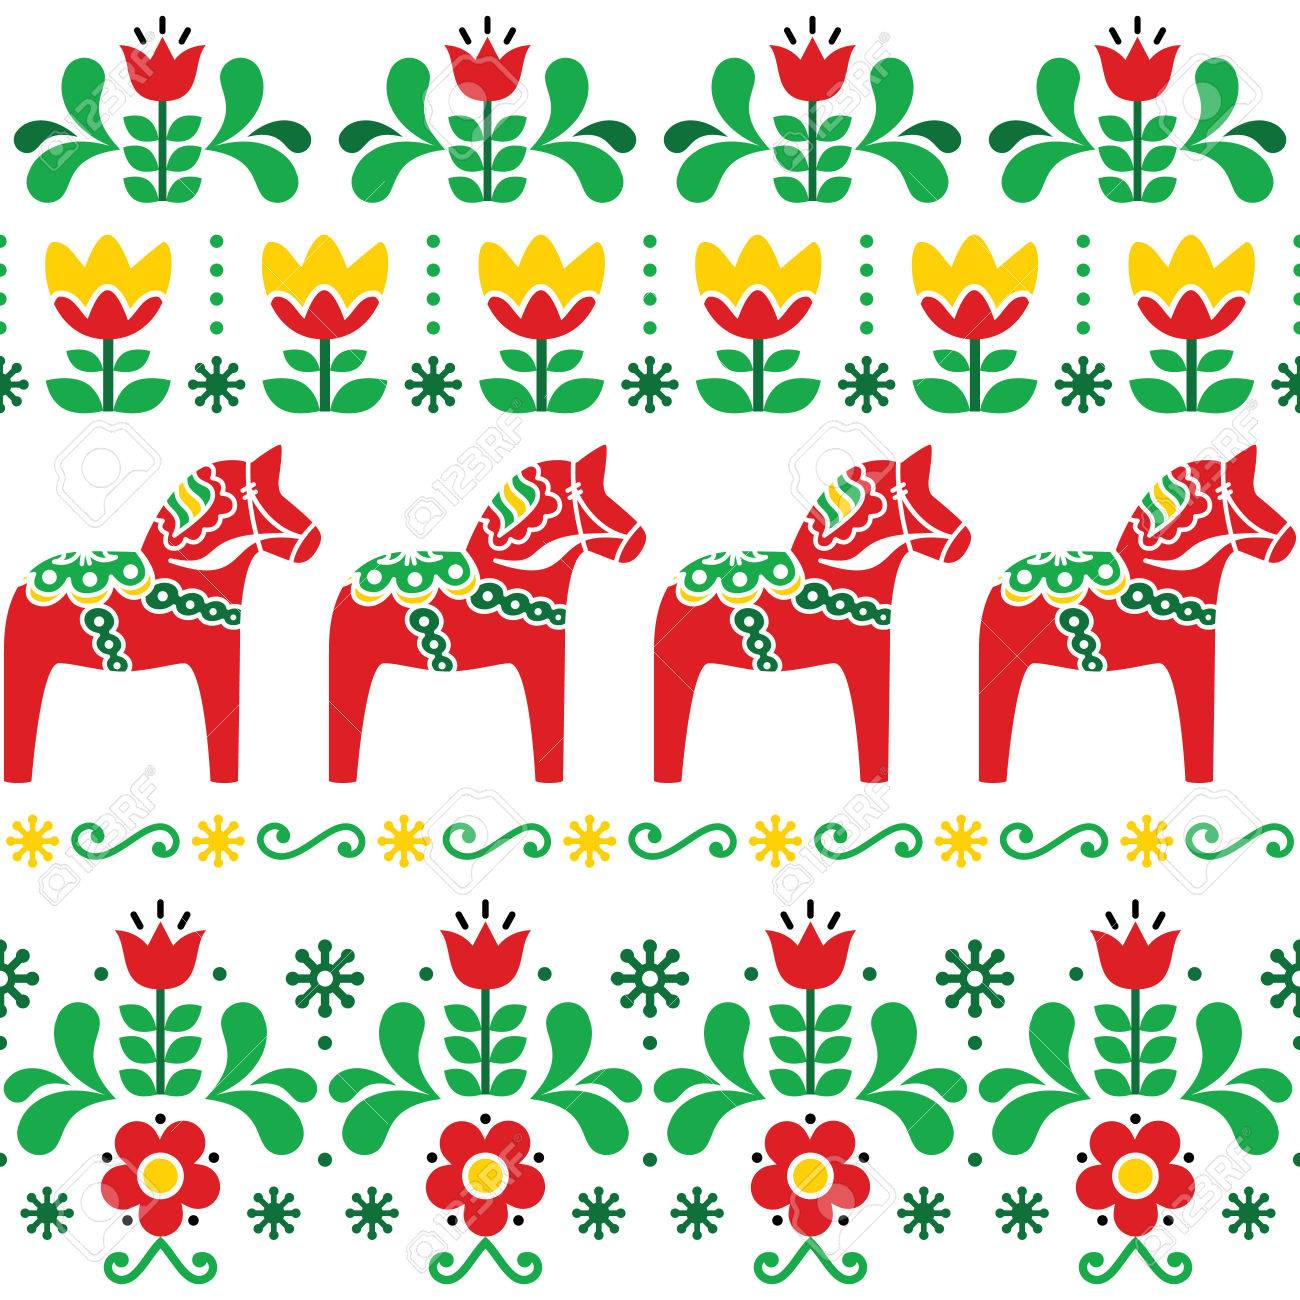 Swedish Dala Horse Pattern Scandinavian Seamless Folk Art Design Royalty Free Cliparts Vectors And Stock Illustration Image 80914760